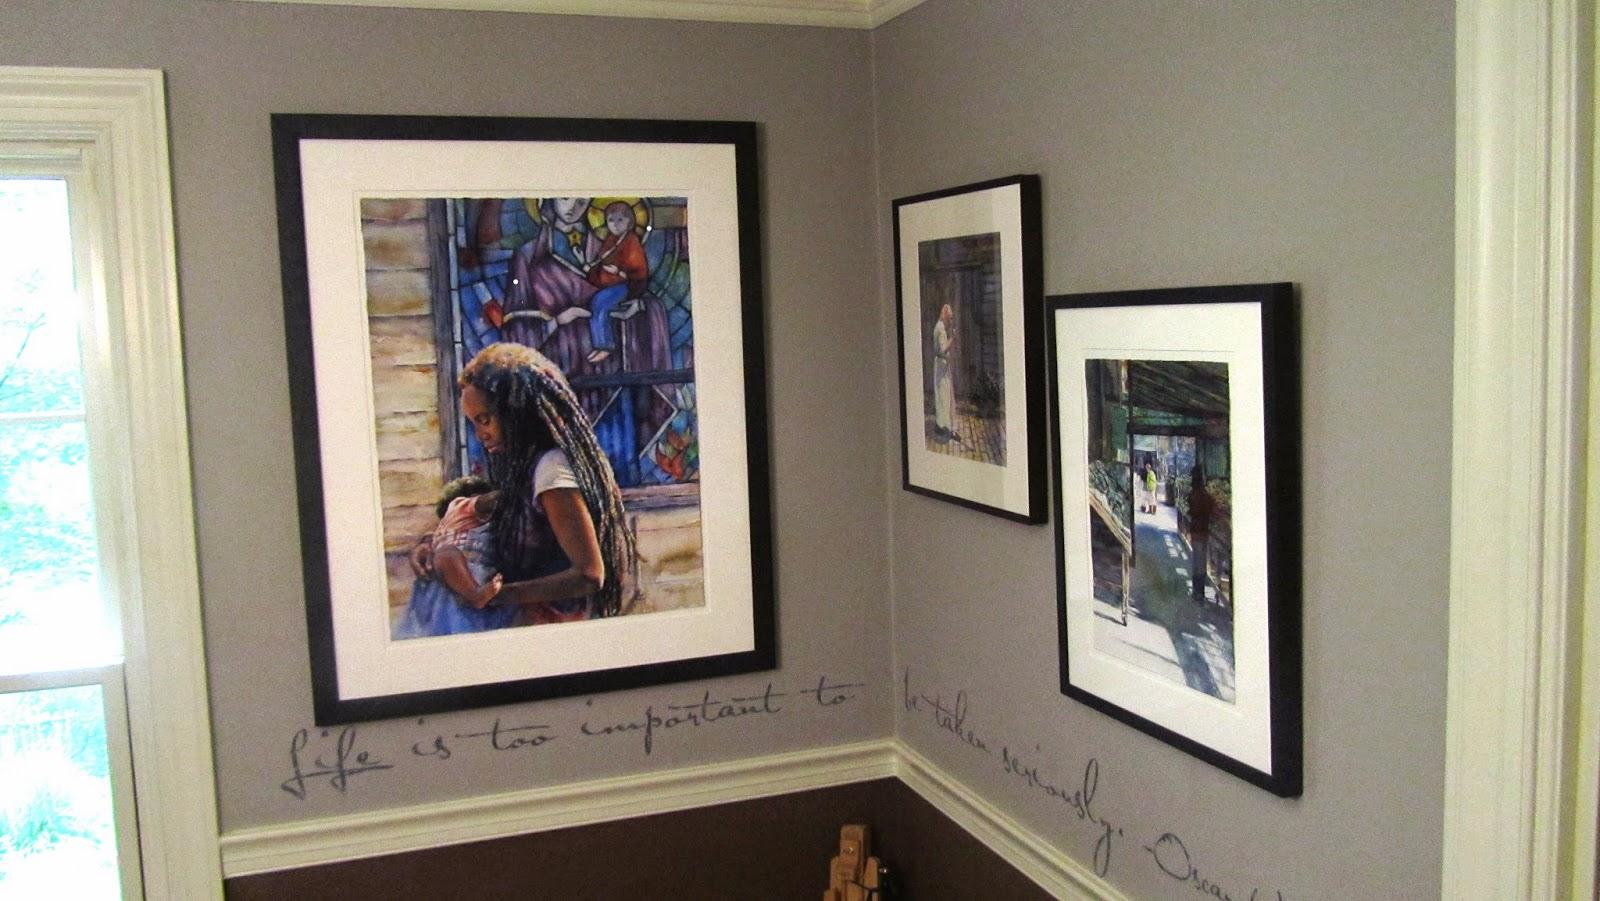 Peggi Habets Studio: Framing Dilemmas